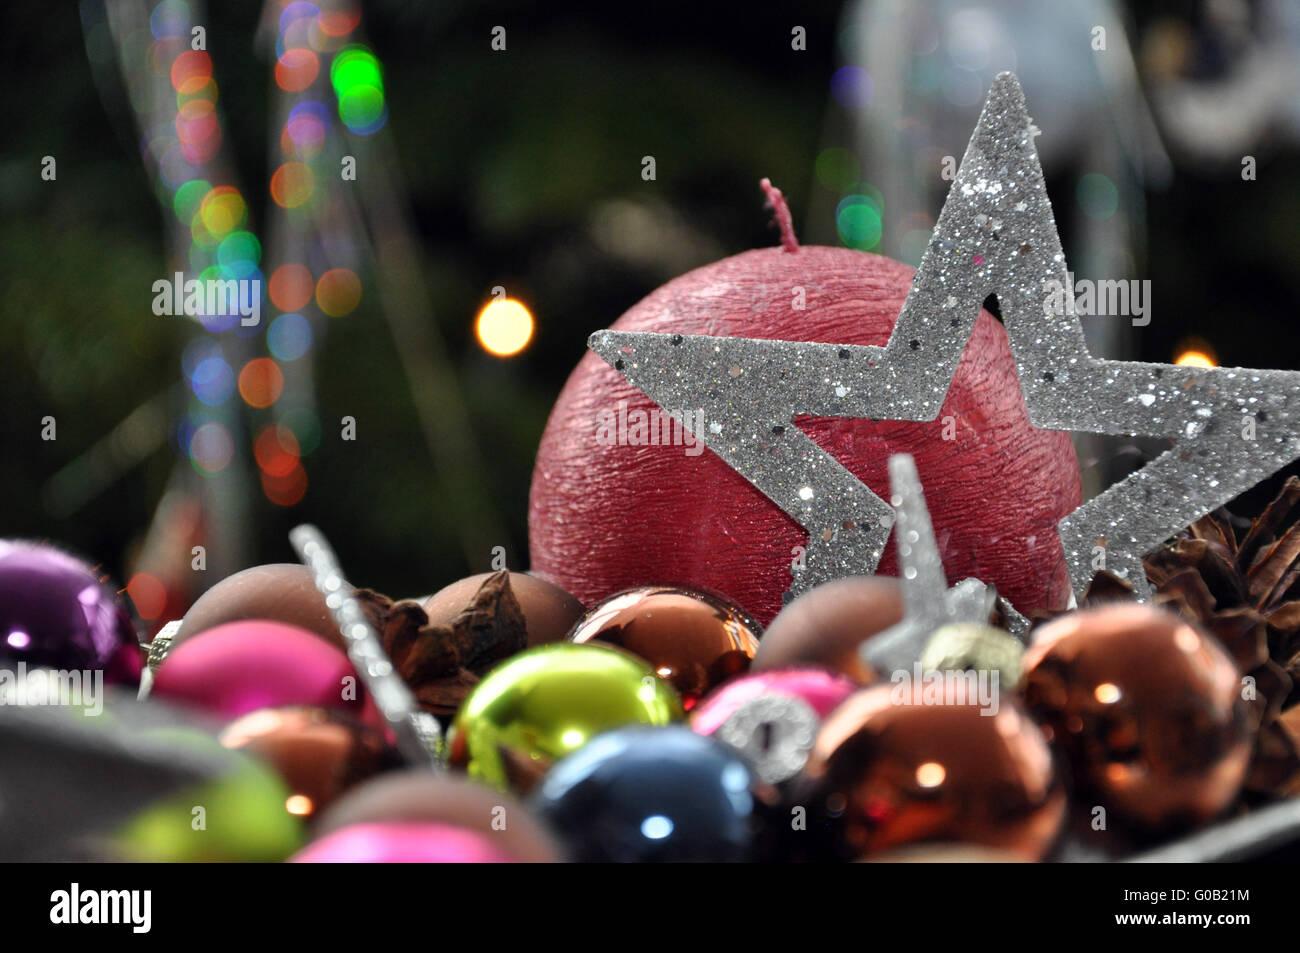 Weihnachtsszene mit Kerze Stockfoto, Bild: 103505296 - Alamy